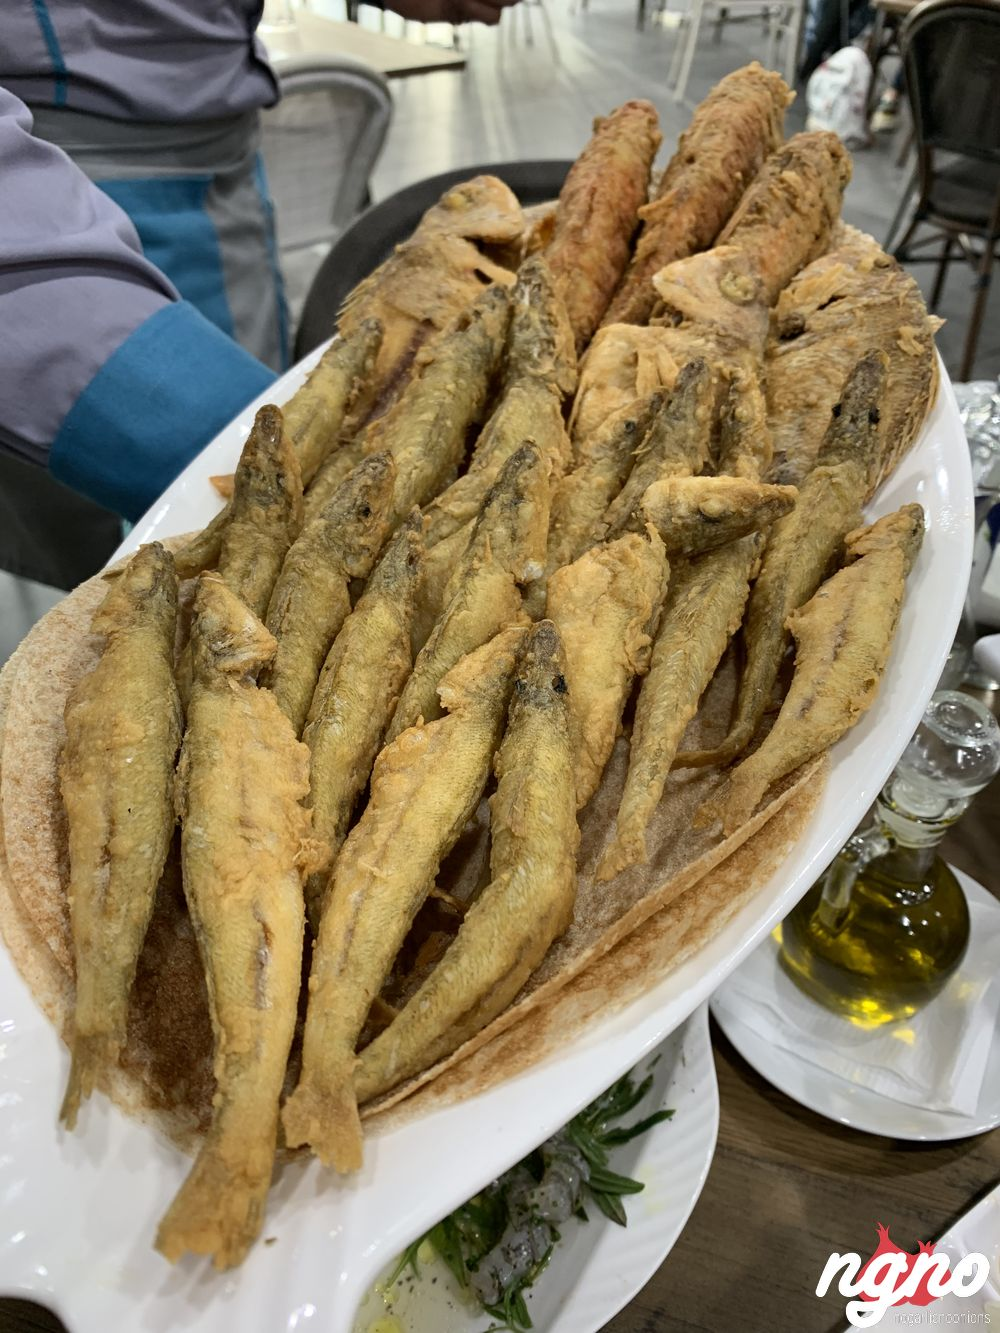 kesrwani-seafood-fish-antelias-nogarlicnoonions-132019-06-06-08-38-49